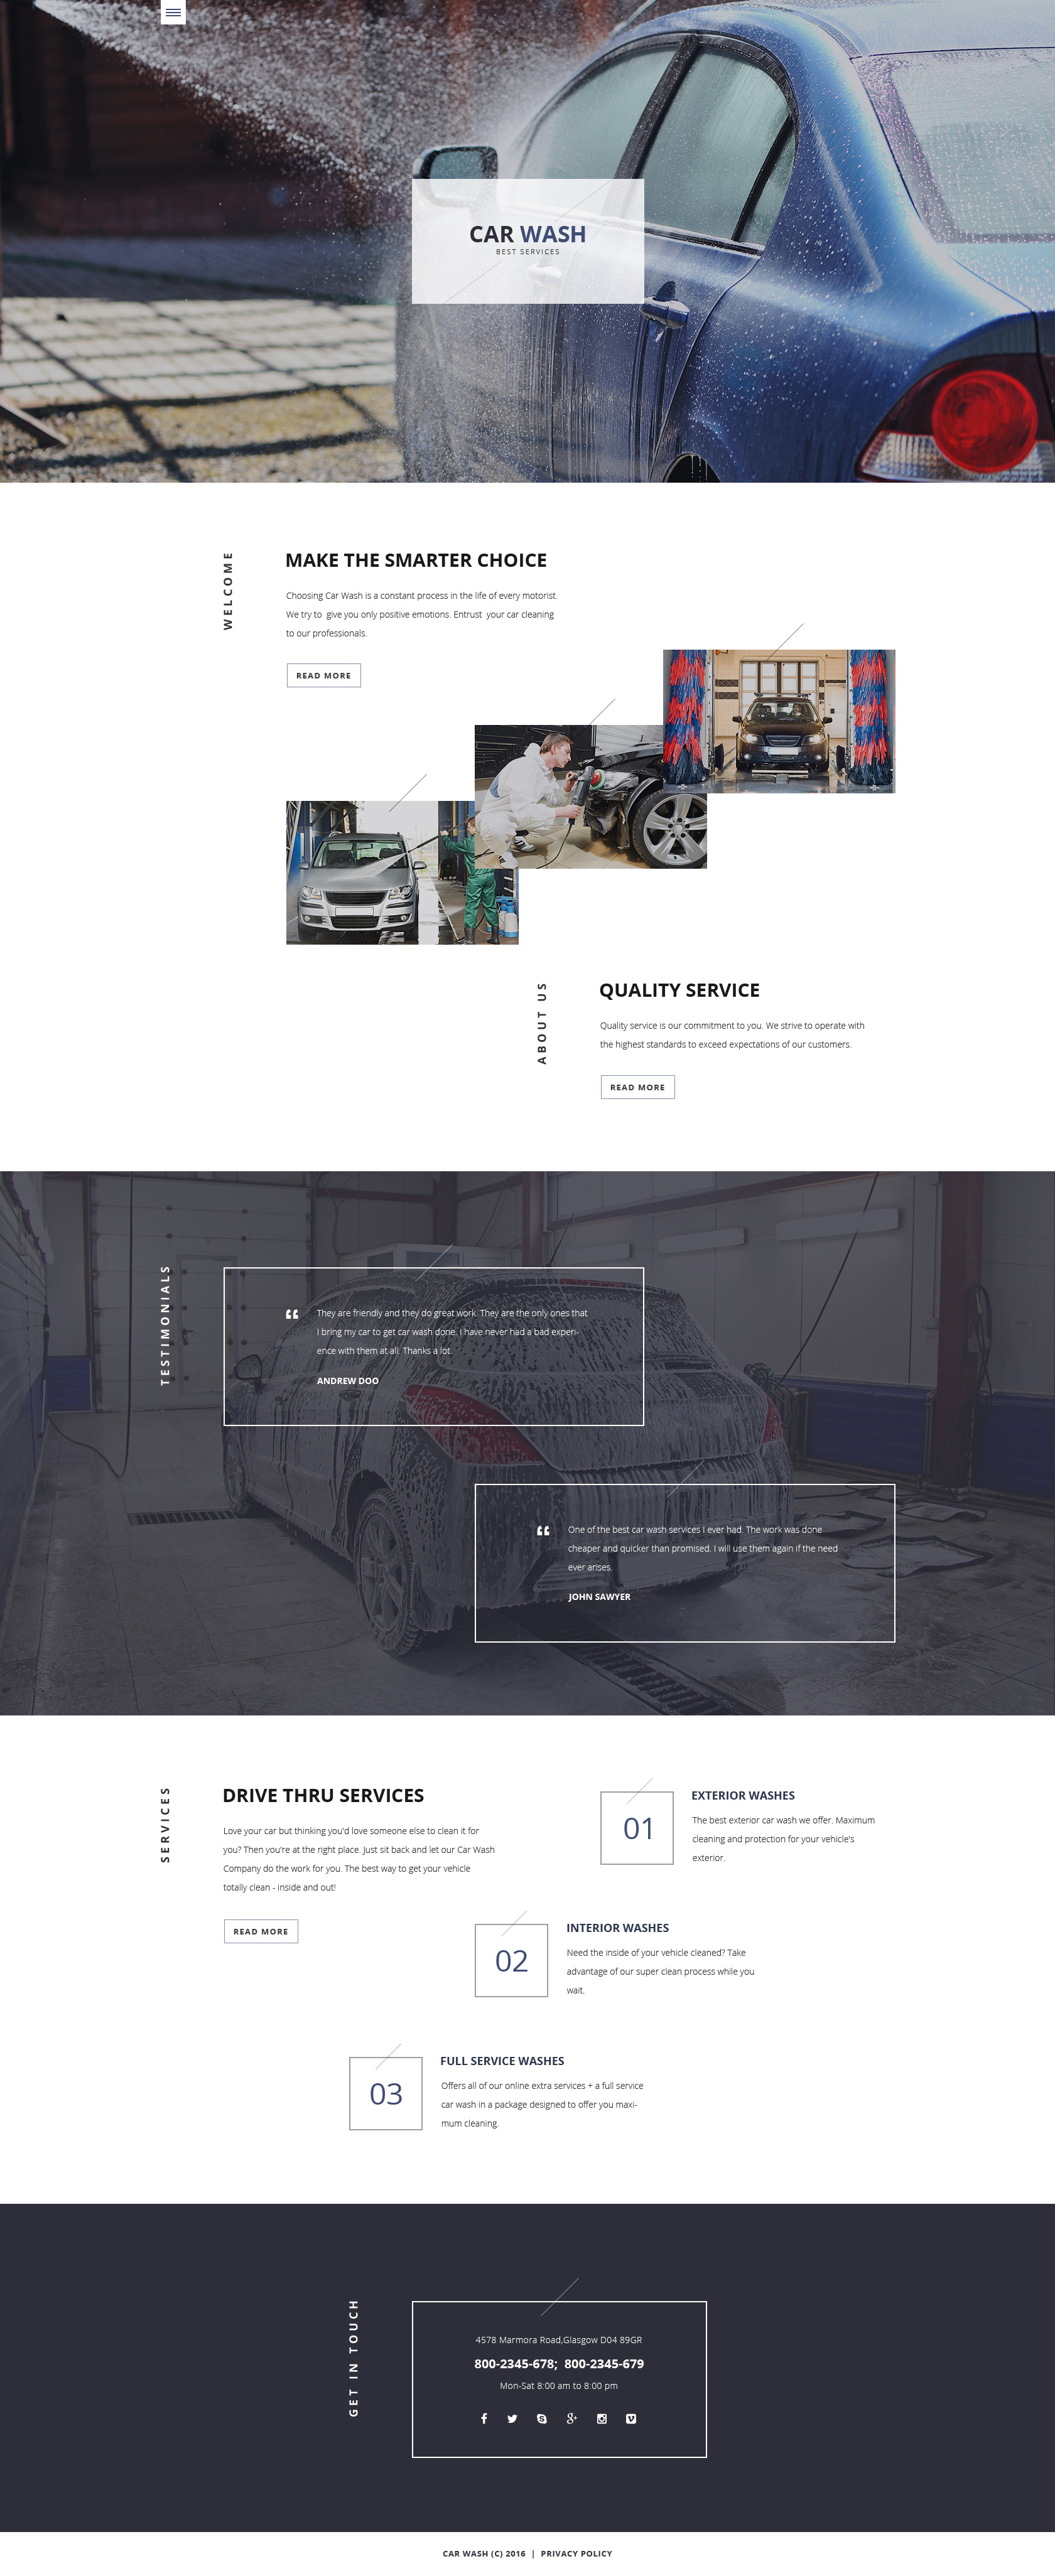 Car Wash Responsive Website Template - screenshot